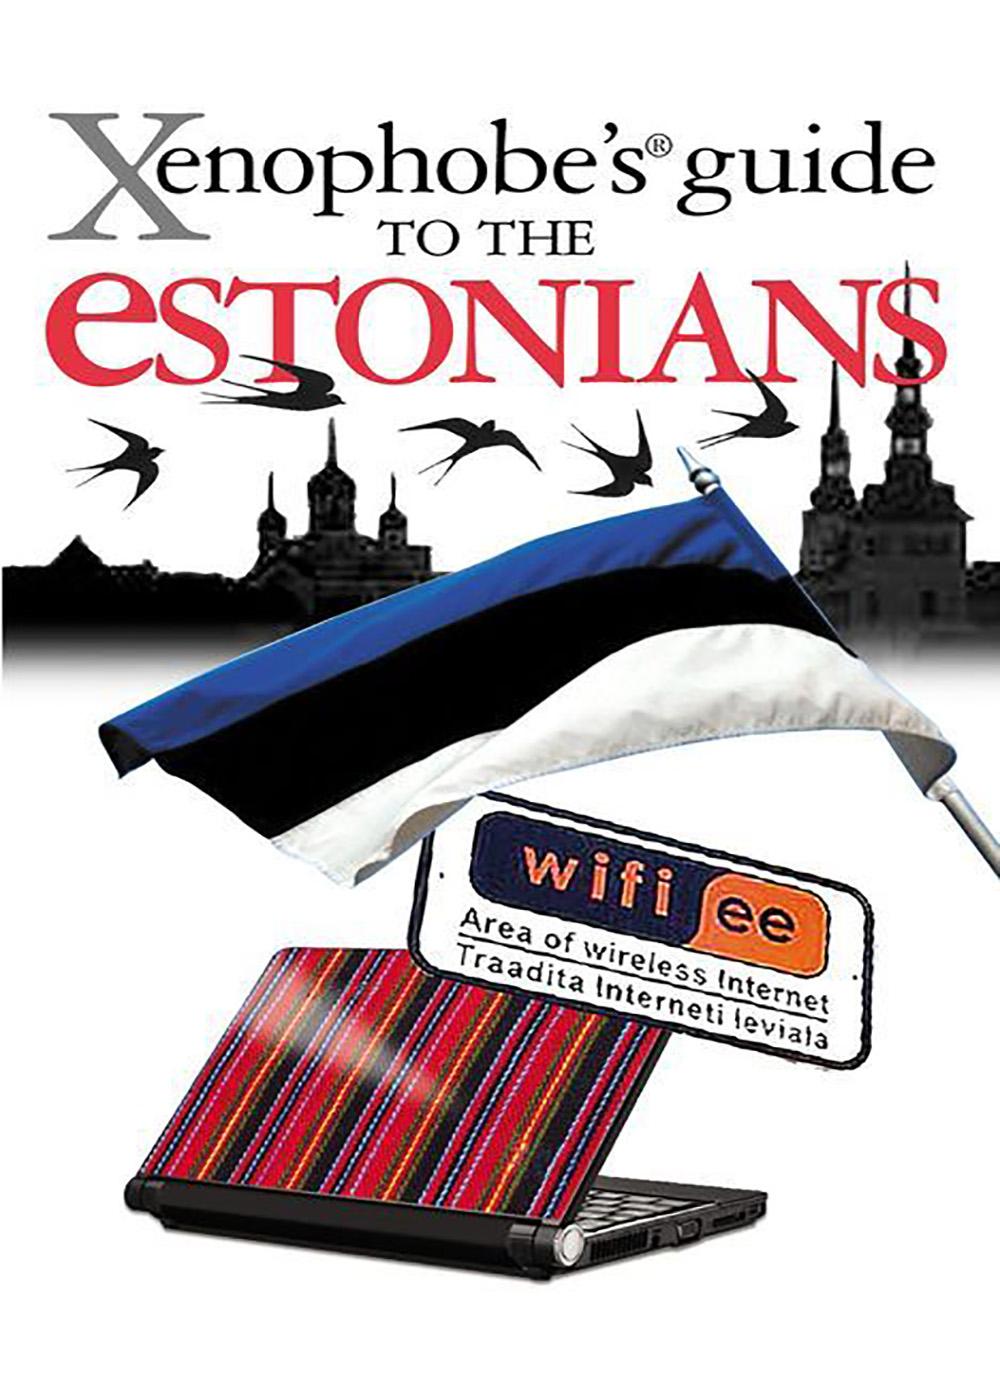 Hilary Bird - Xenophobe's guide to the Estonians